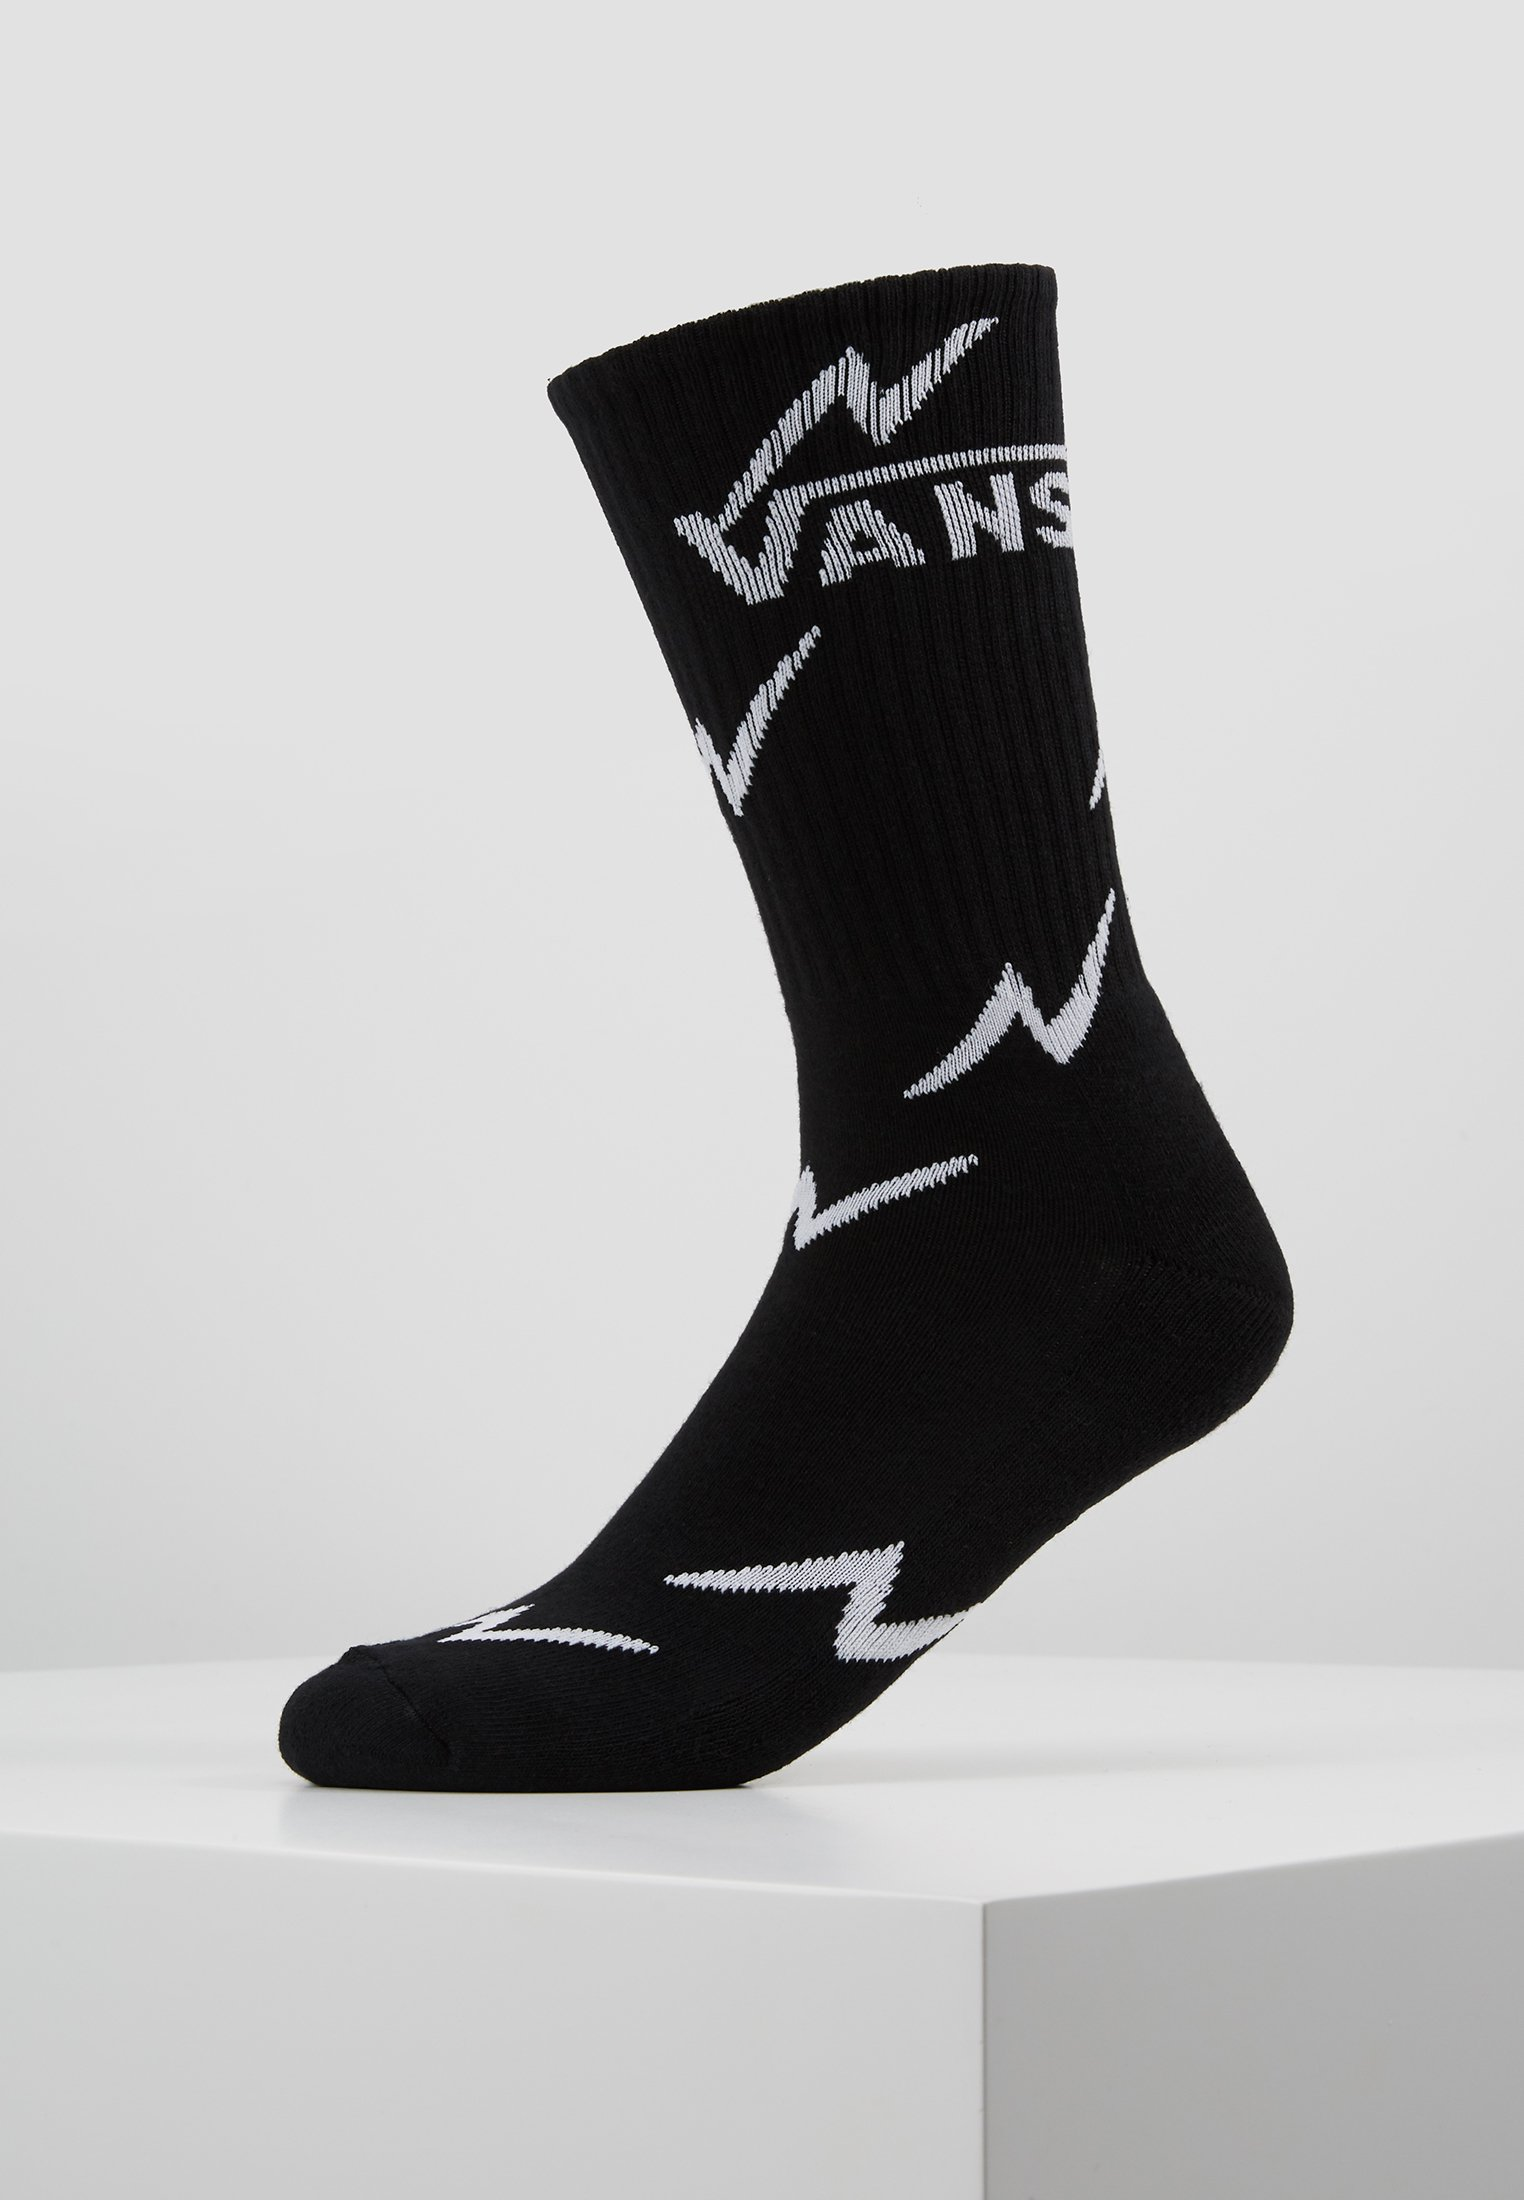 Vans The Crew Socken für Herren Günstig Vans Socken Weiß